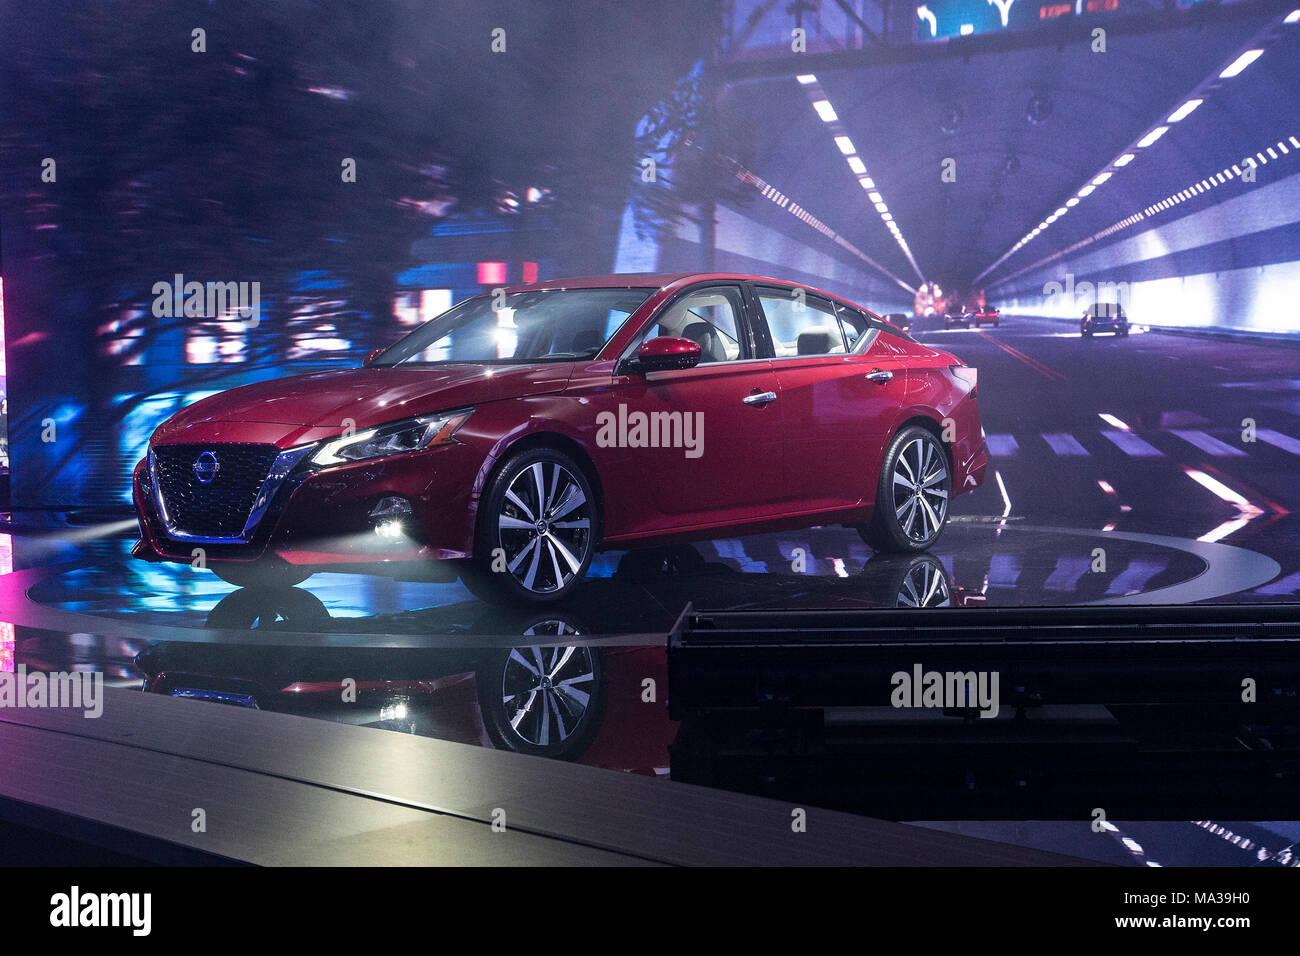 New York United States 28th Mar 2018 Nissan Altima